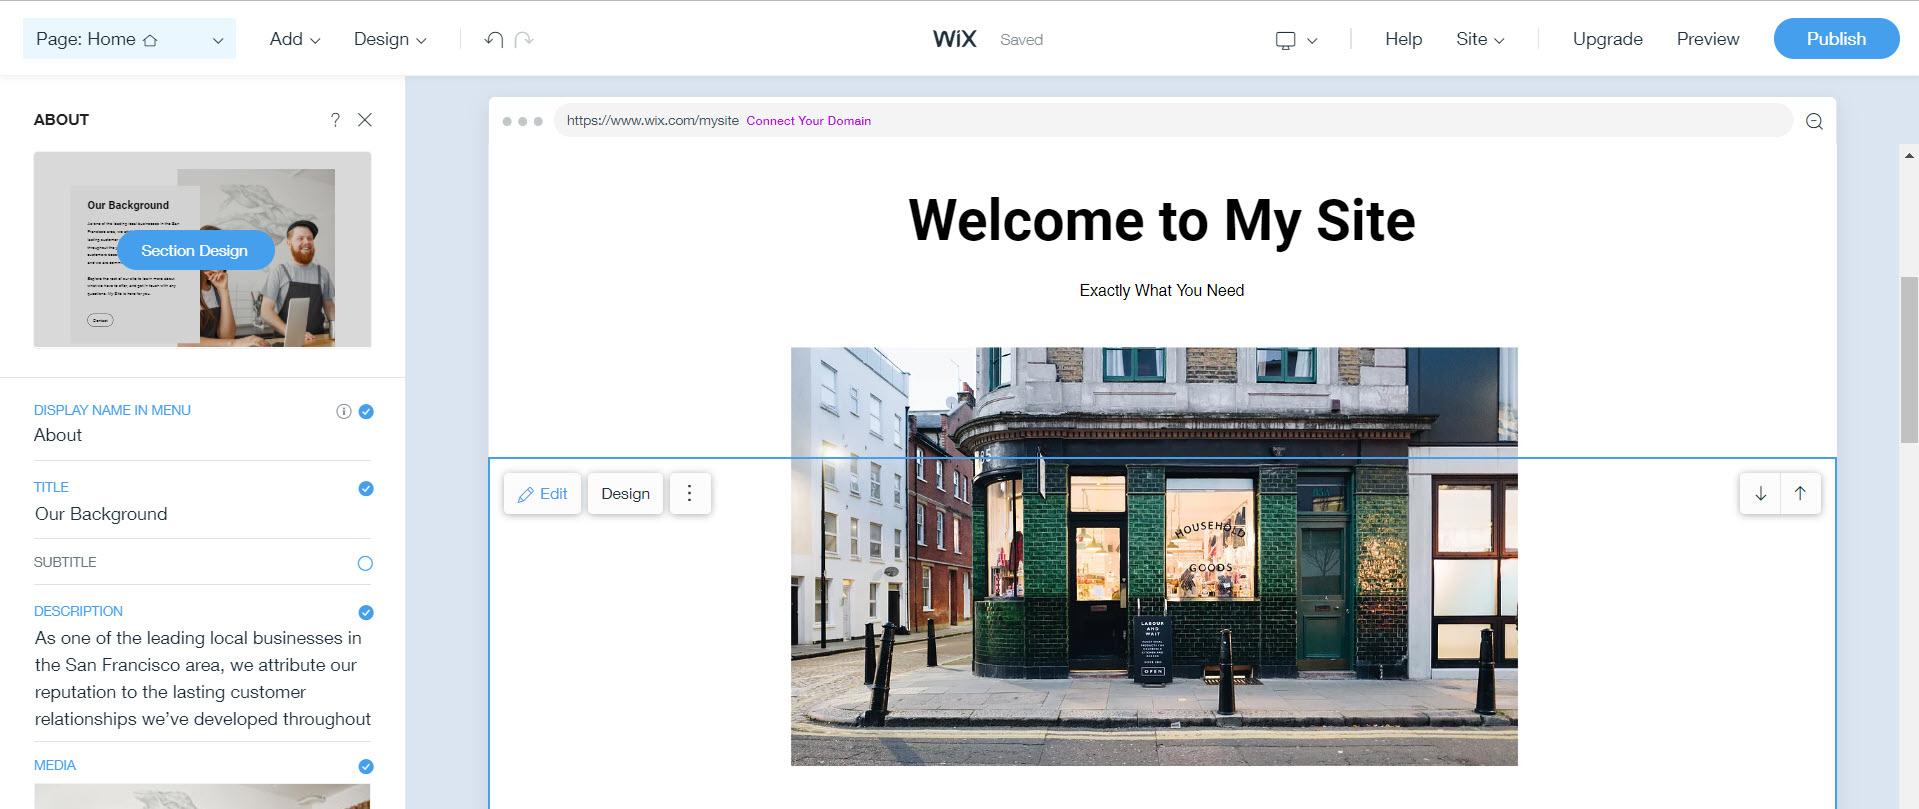 Wix ADI website editor